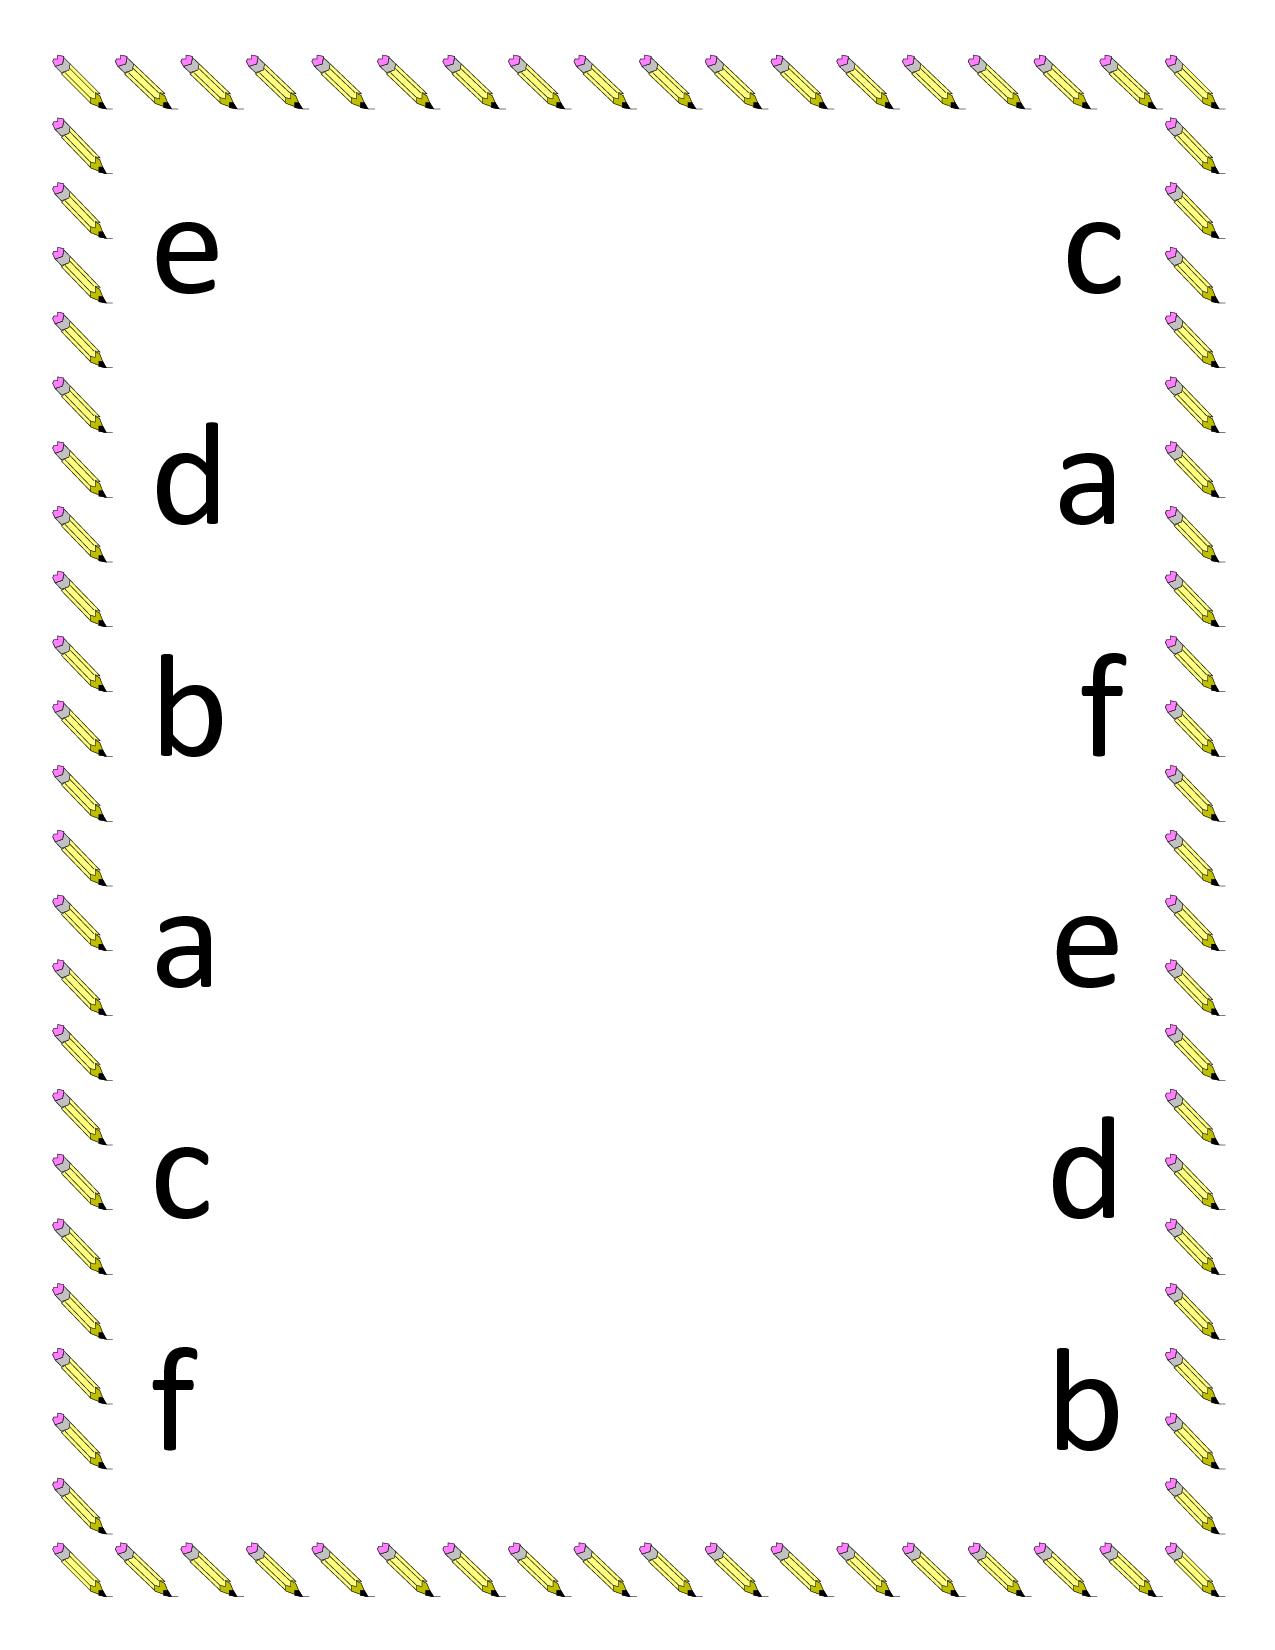 Preschool Science Worksheets Printables | Preschool Matching with regard to Alphabet Matching Worksheets For Kindergarten